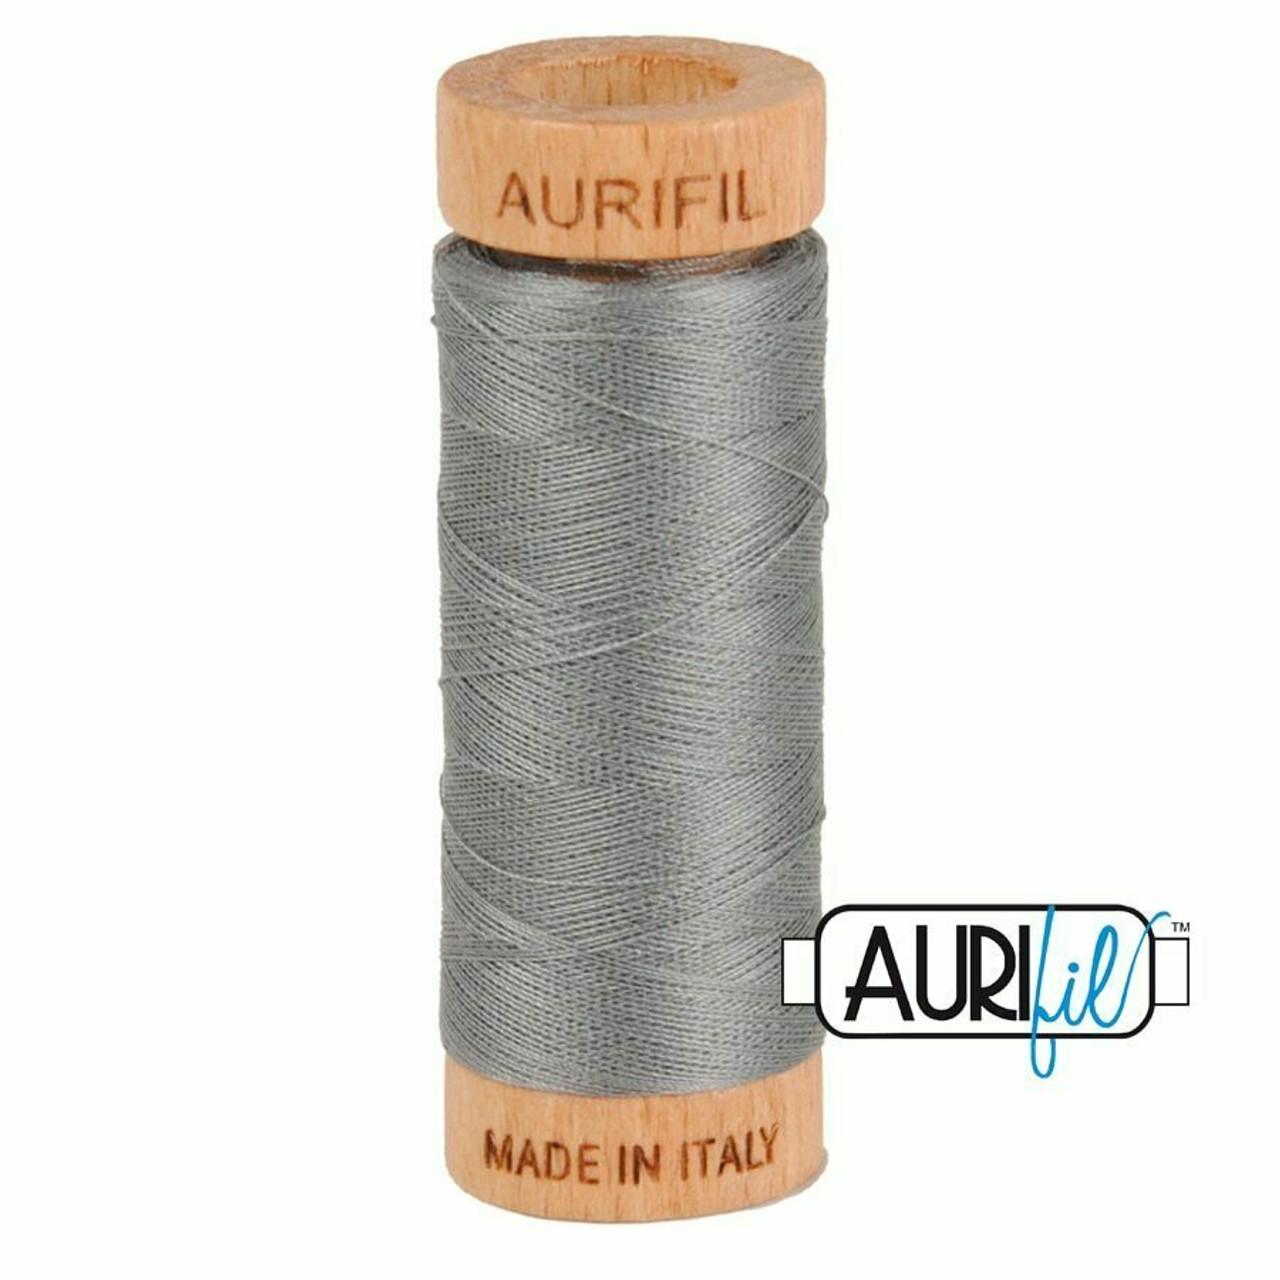 Aurifil 80wt Artic Ice (2625) thread